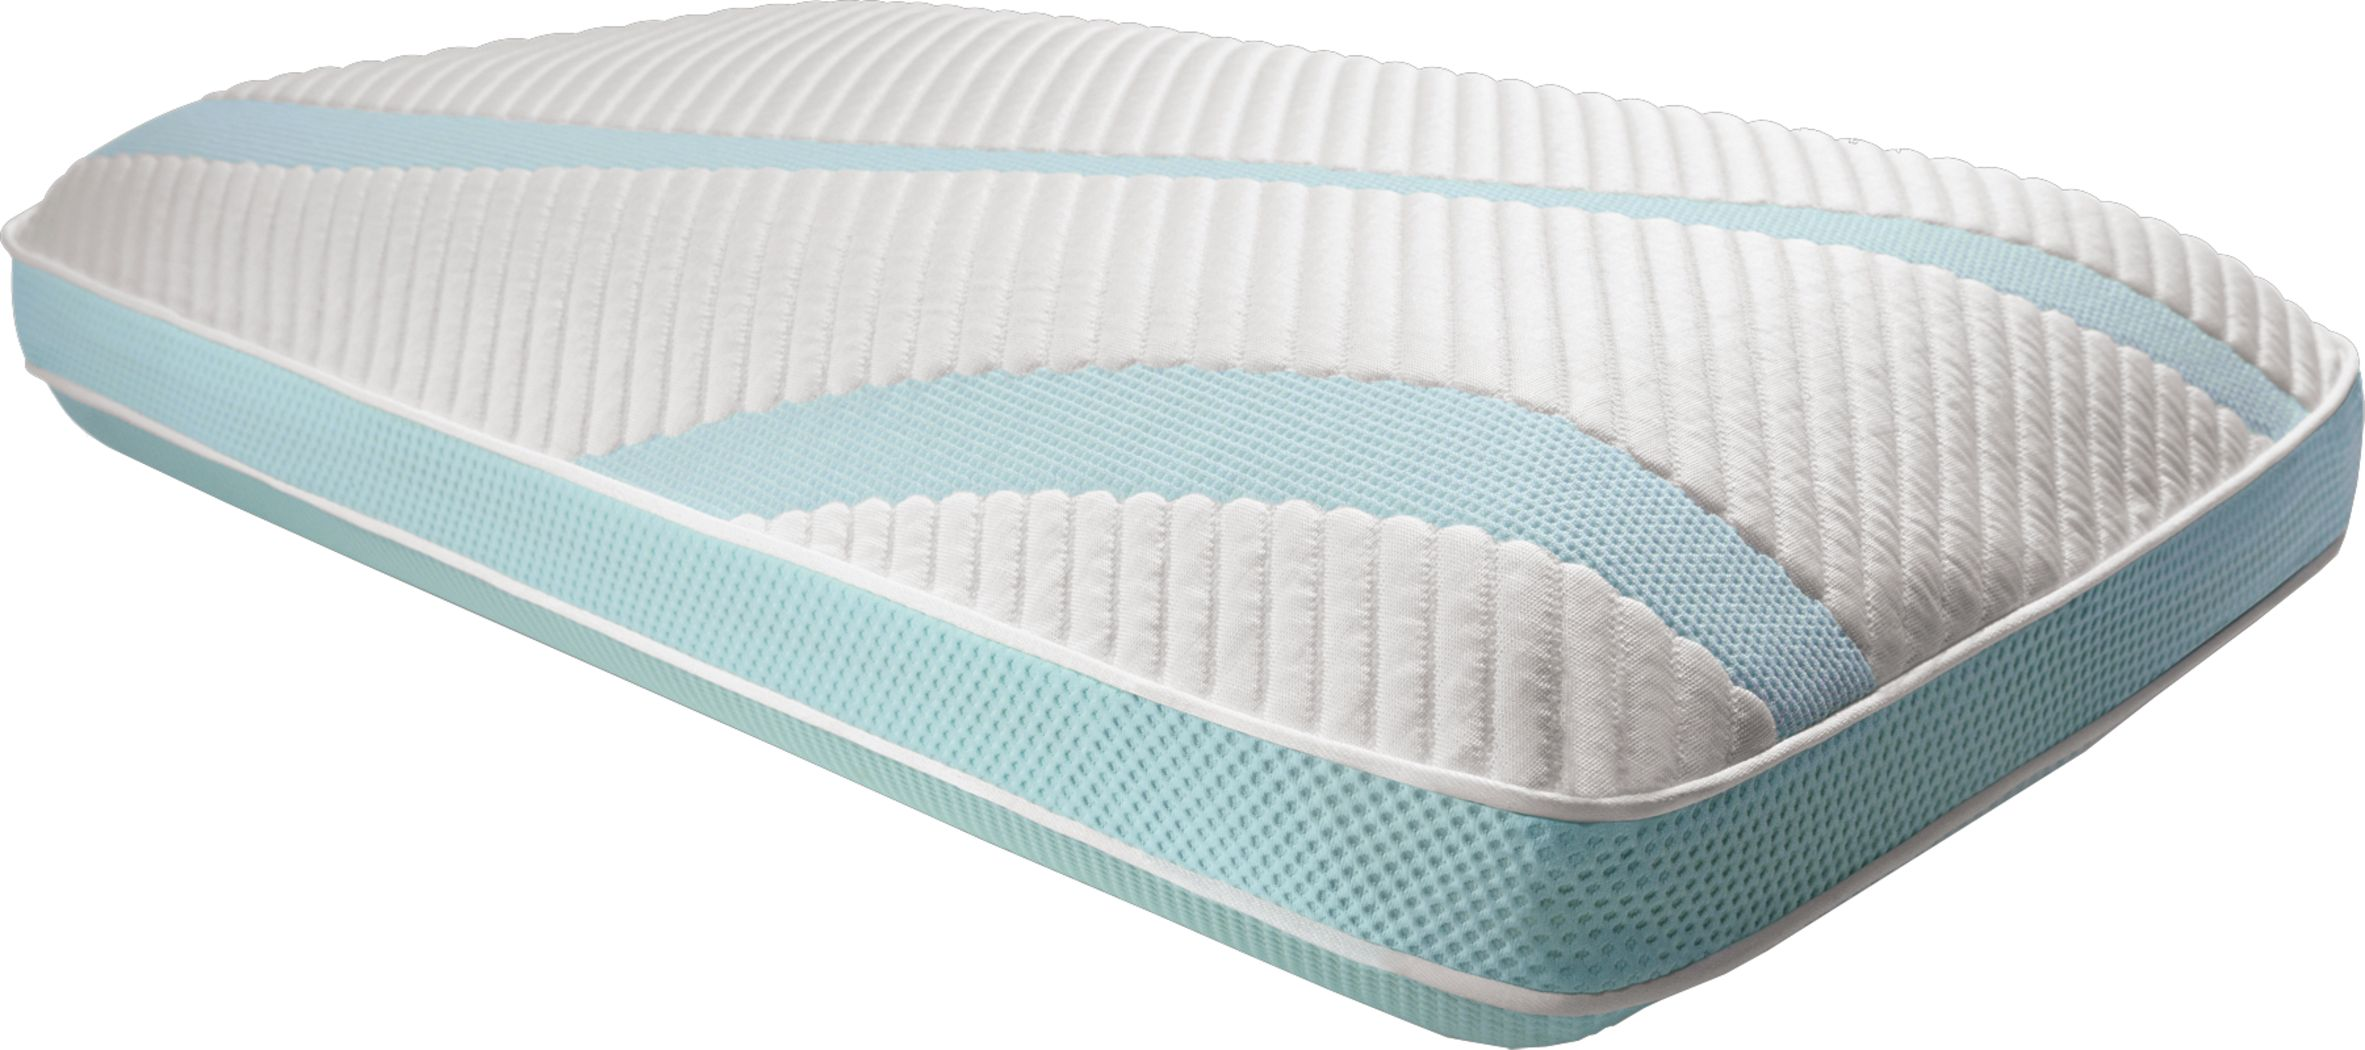 TEMPUR-Adapt Pro-Hi Standard Pillow